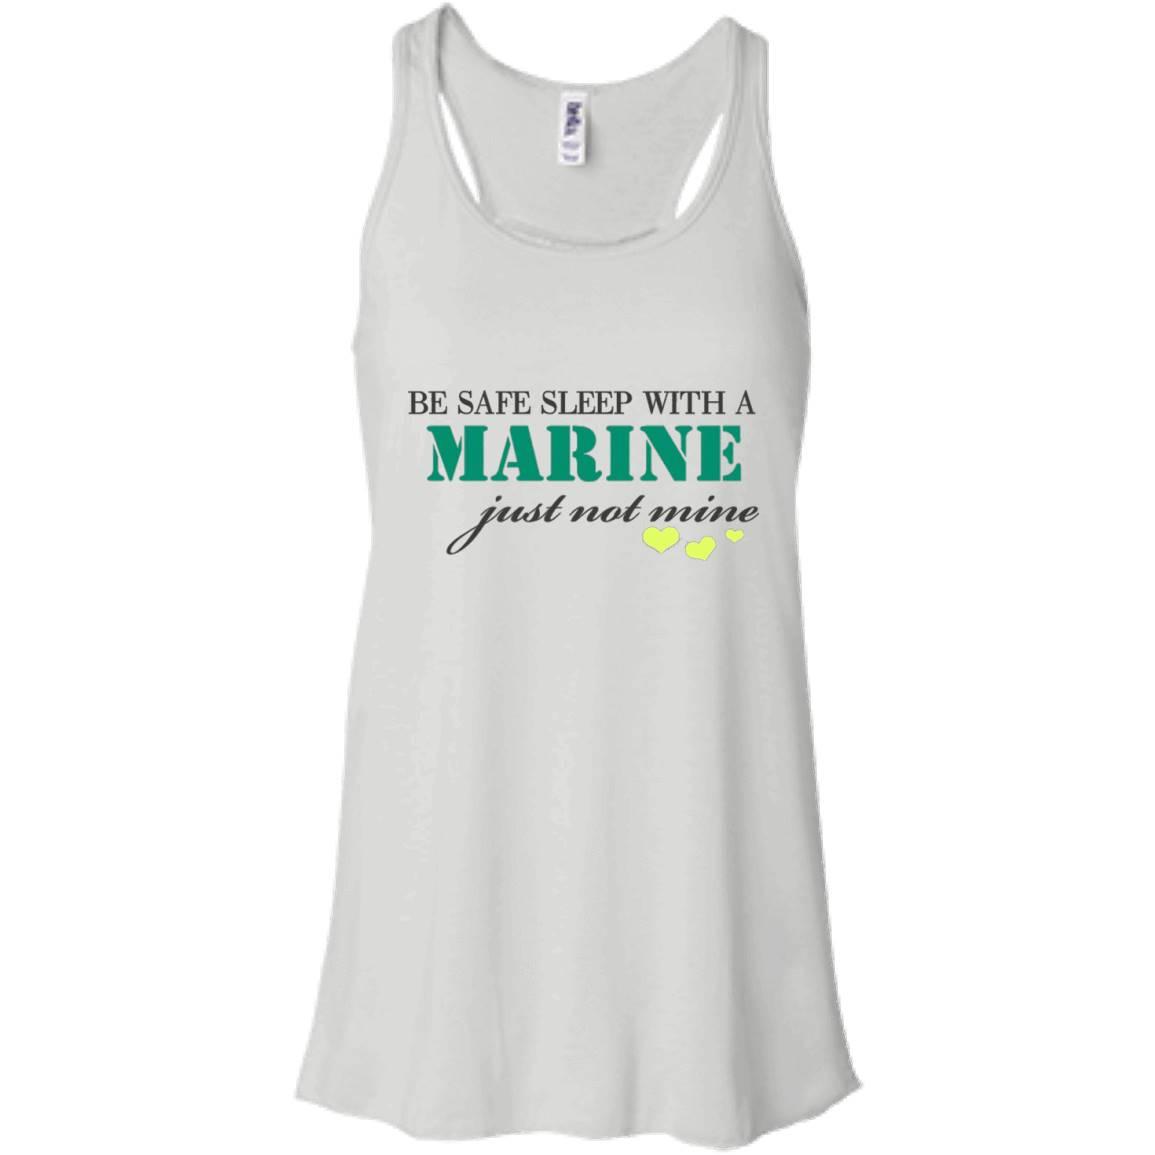 Marine TShirt Be Safe Sleep With A Marine Shirt – Women Tank